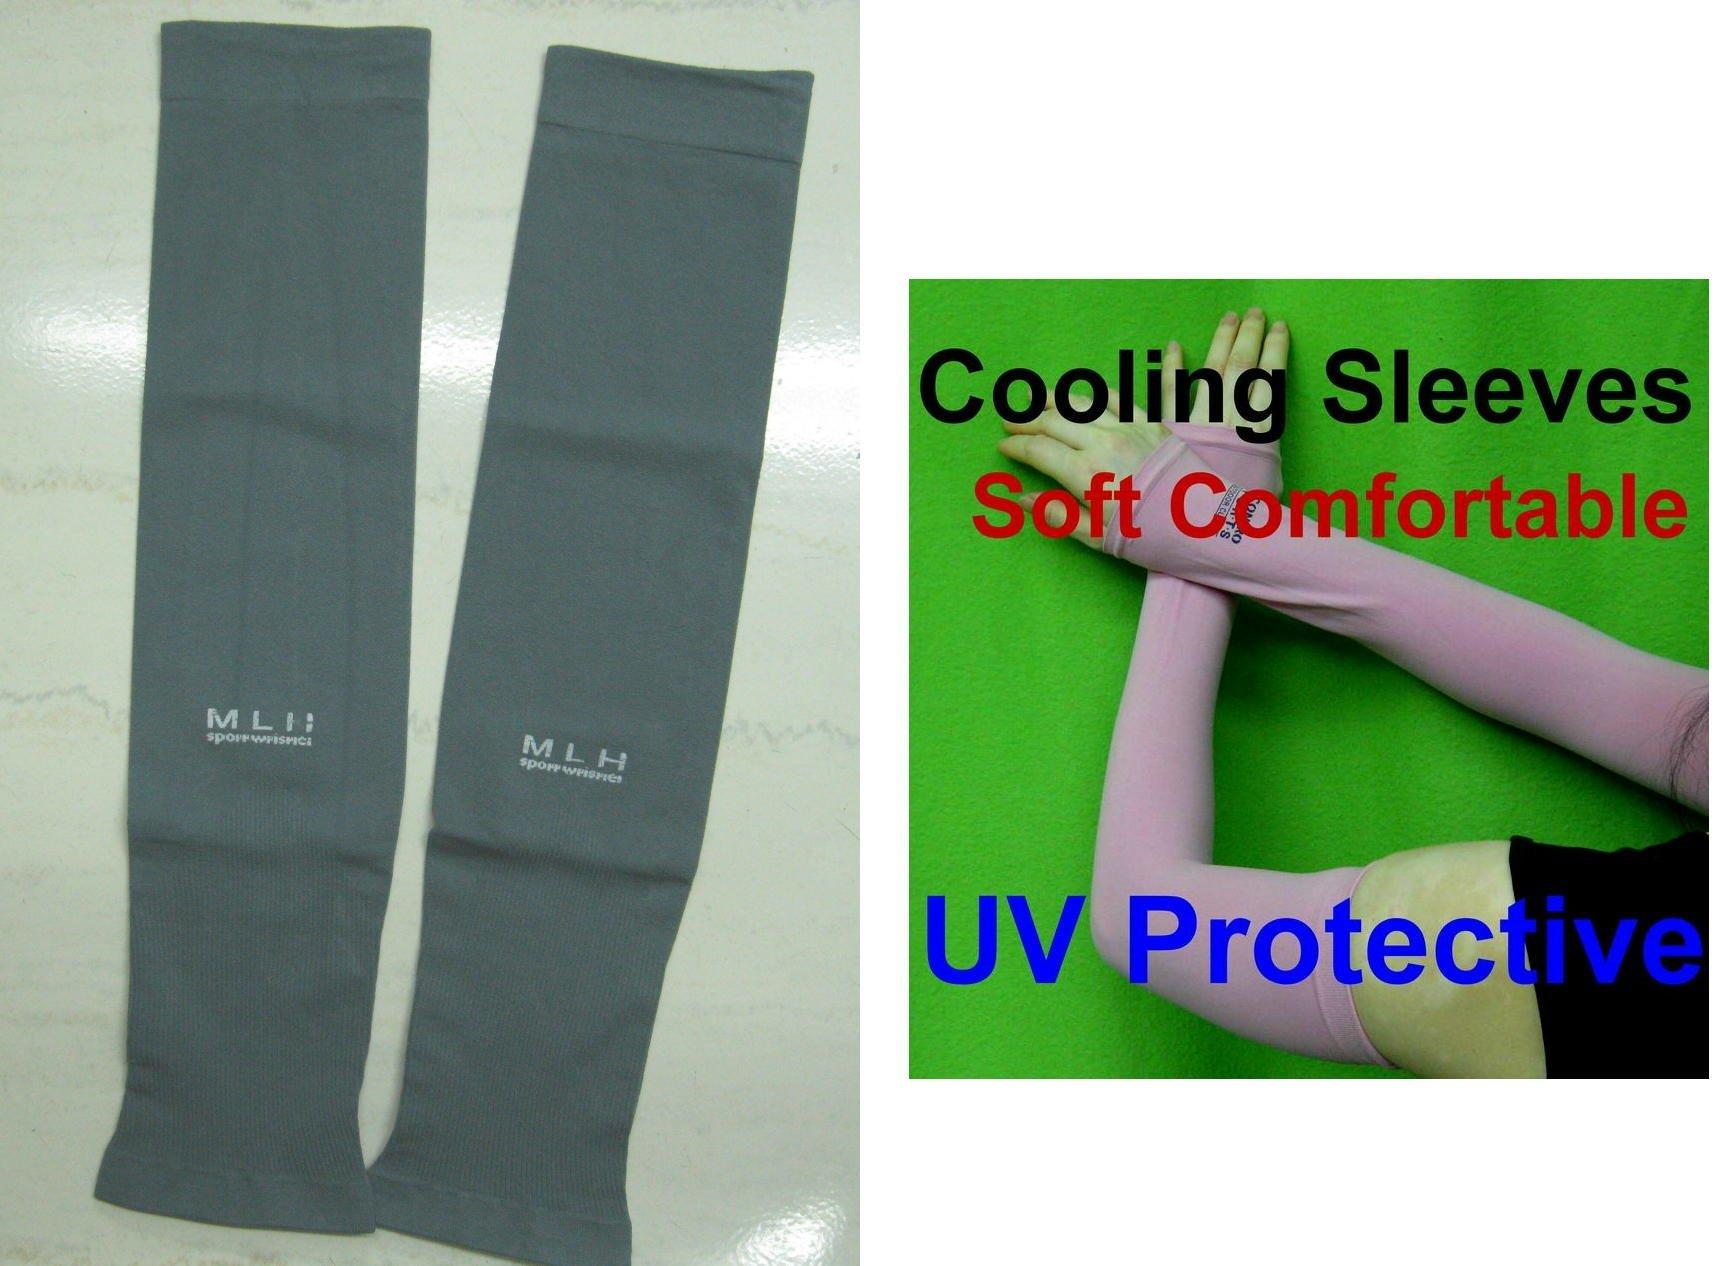 **AdmCity** 灰色涼感袖套 男女 防曬袖套抗UV 紫外線防護 袖套 防曬手套 Y336glove02 現